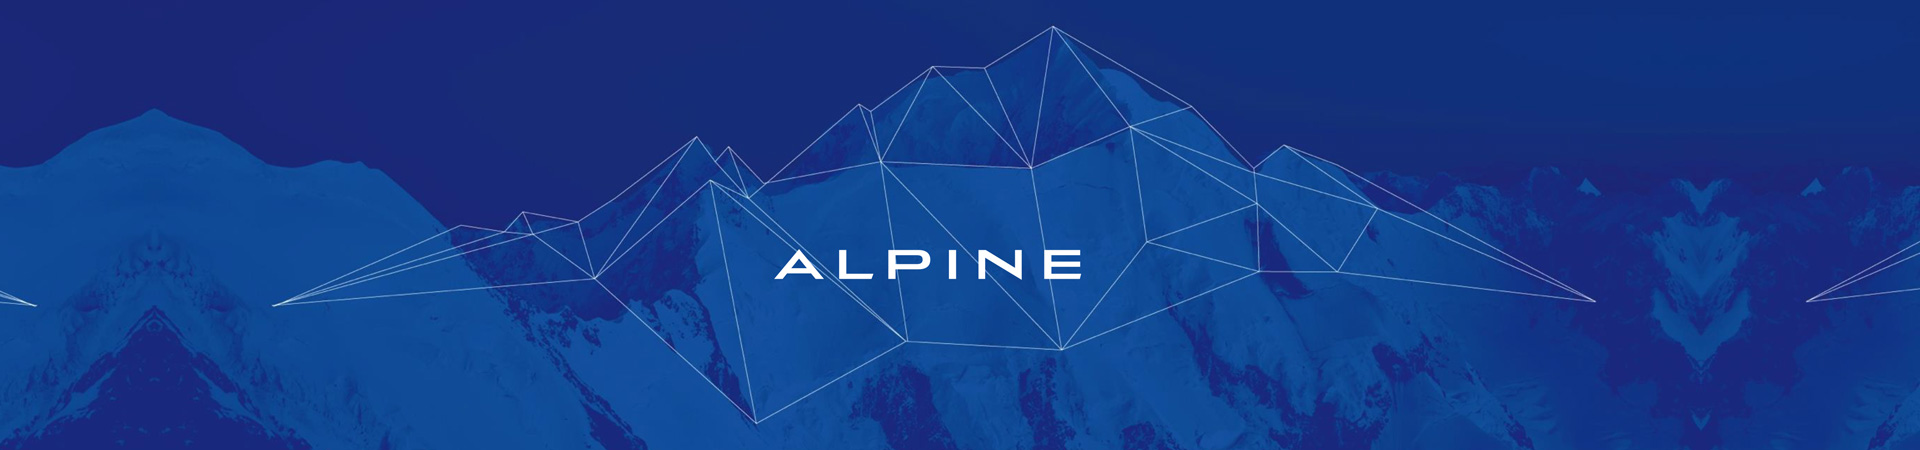 Alpine A110 im Autozentrum P&A-Preckel